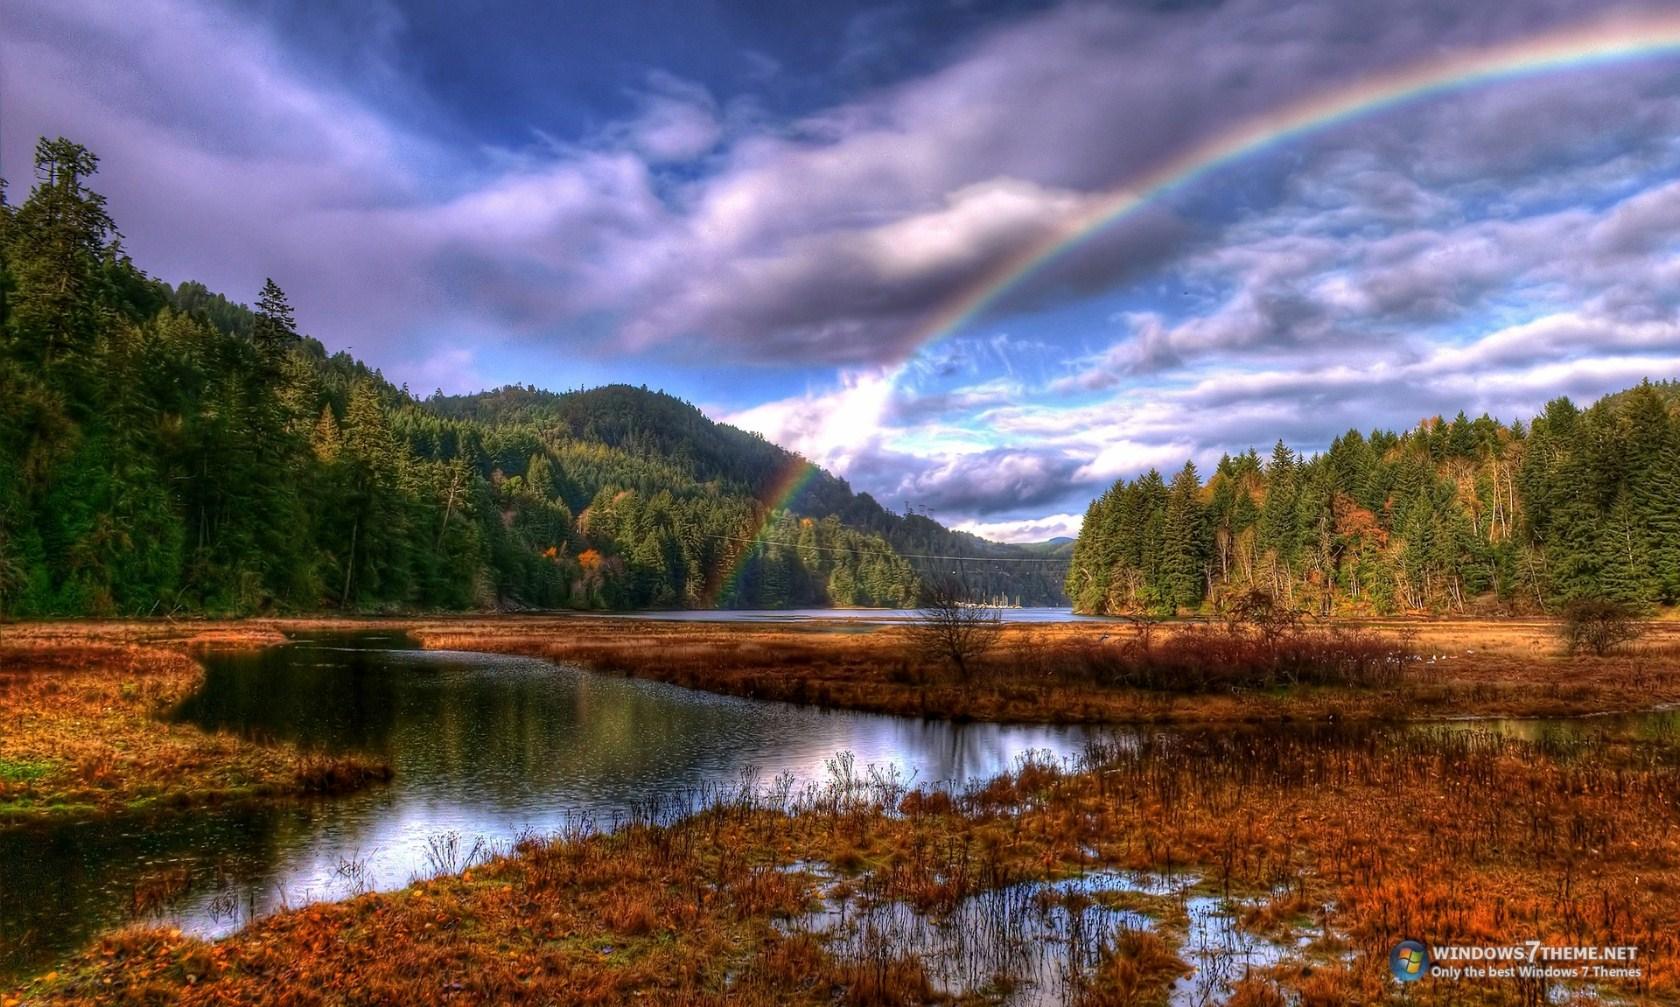 Bing Fall Desktop Wallpaper Rainbows Windows 7 Theme Download